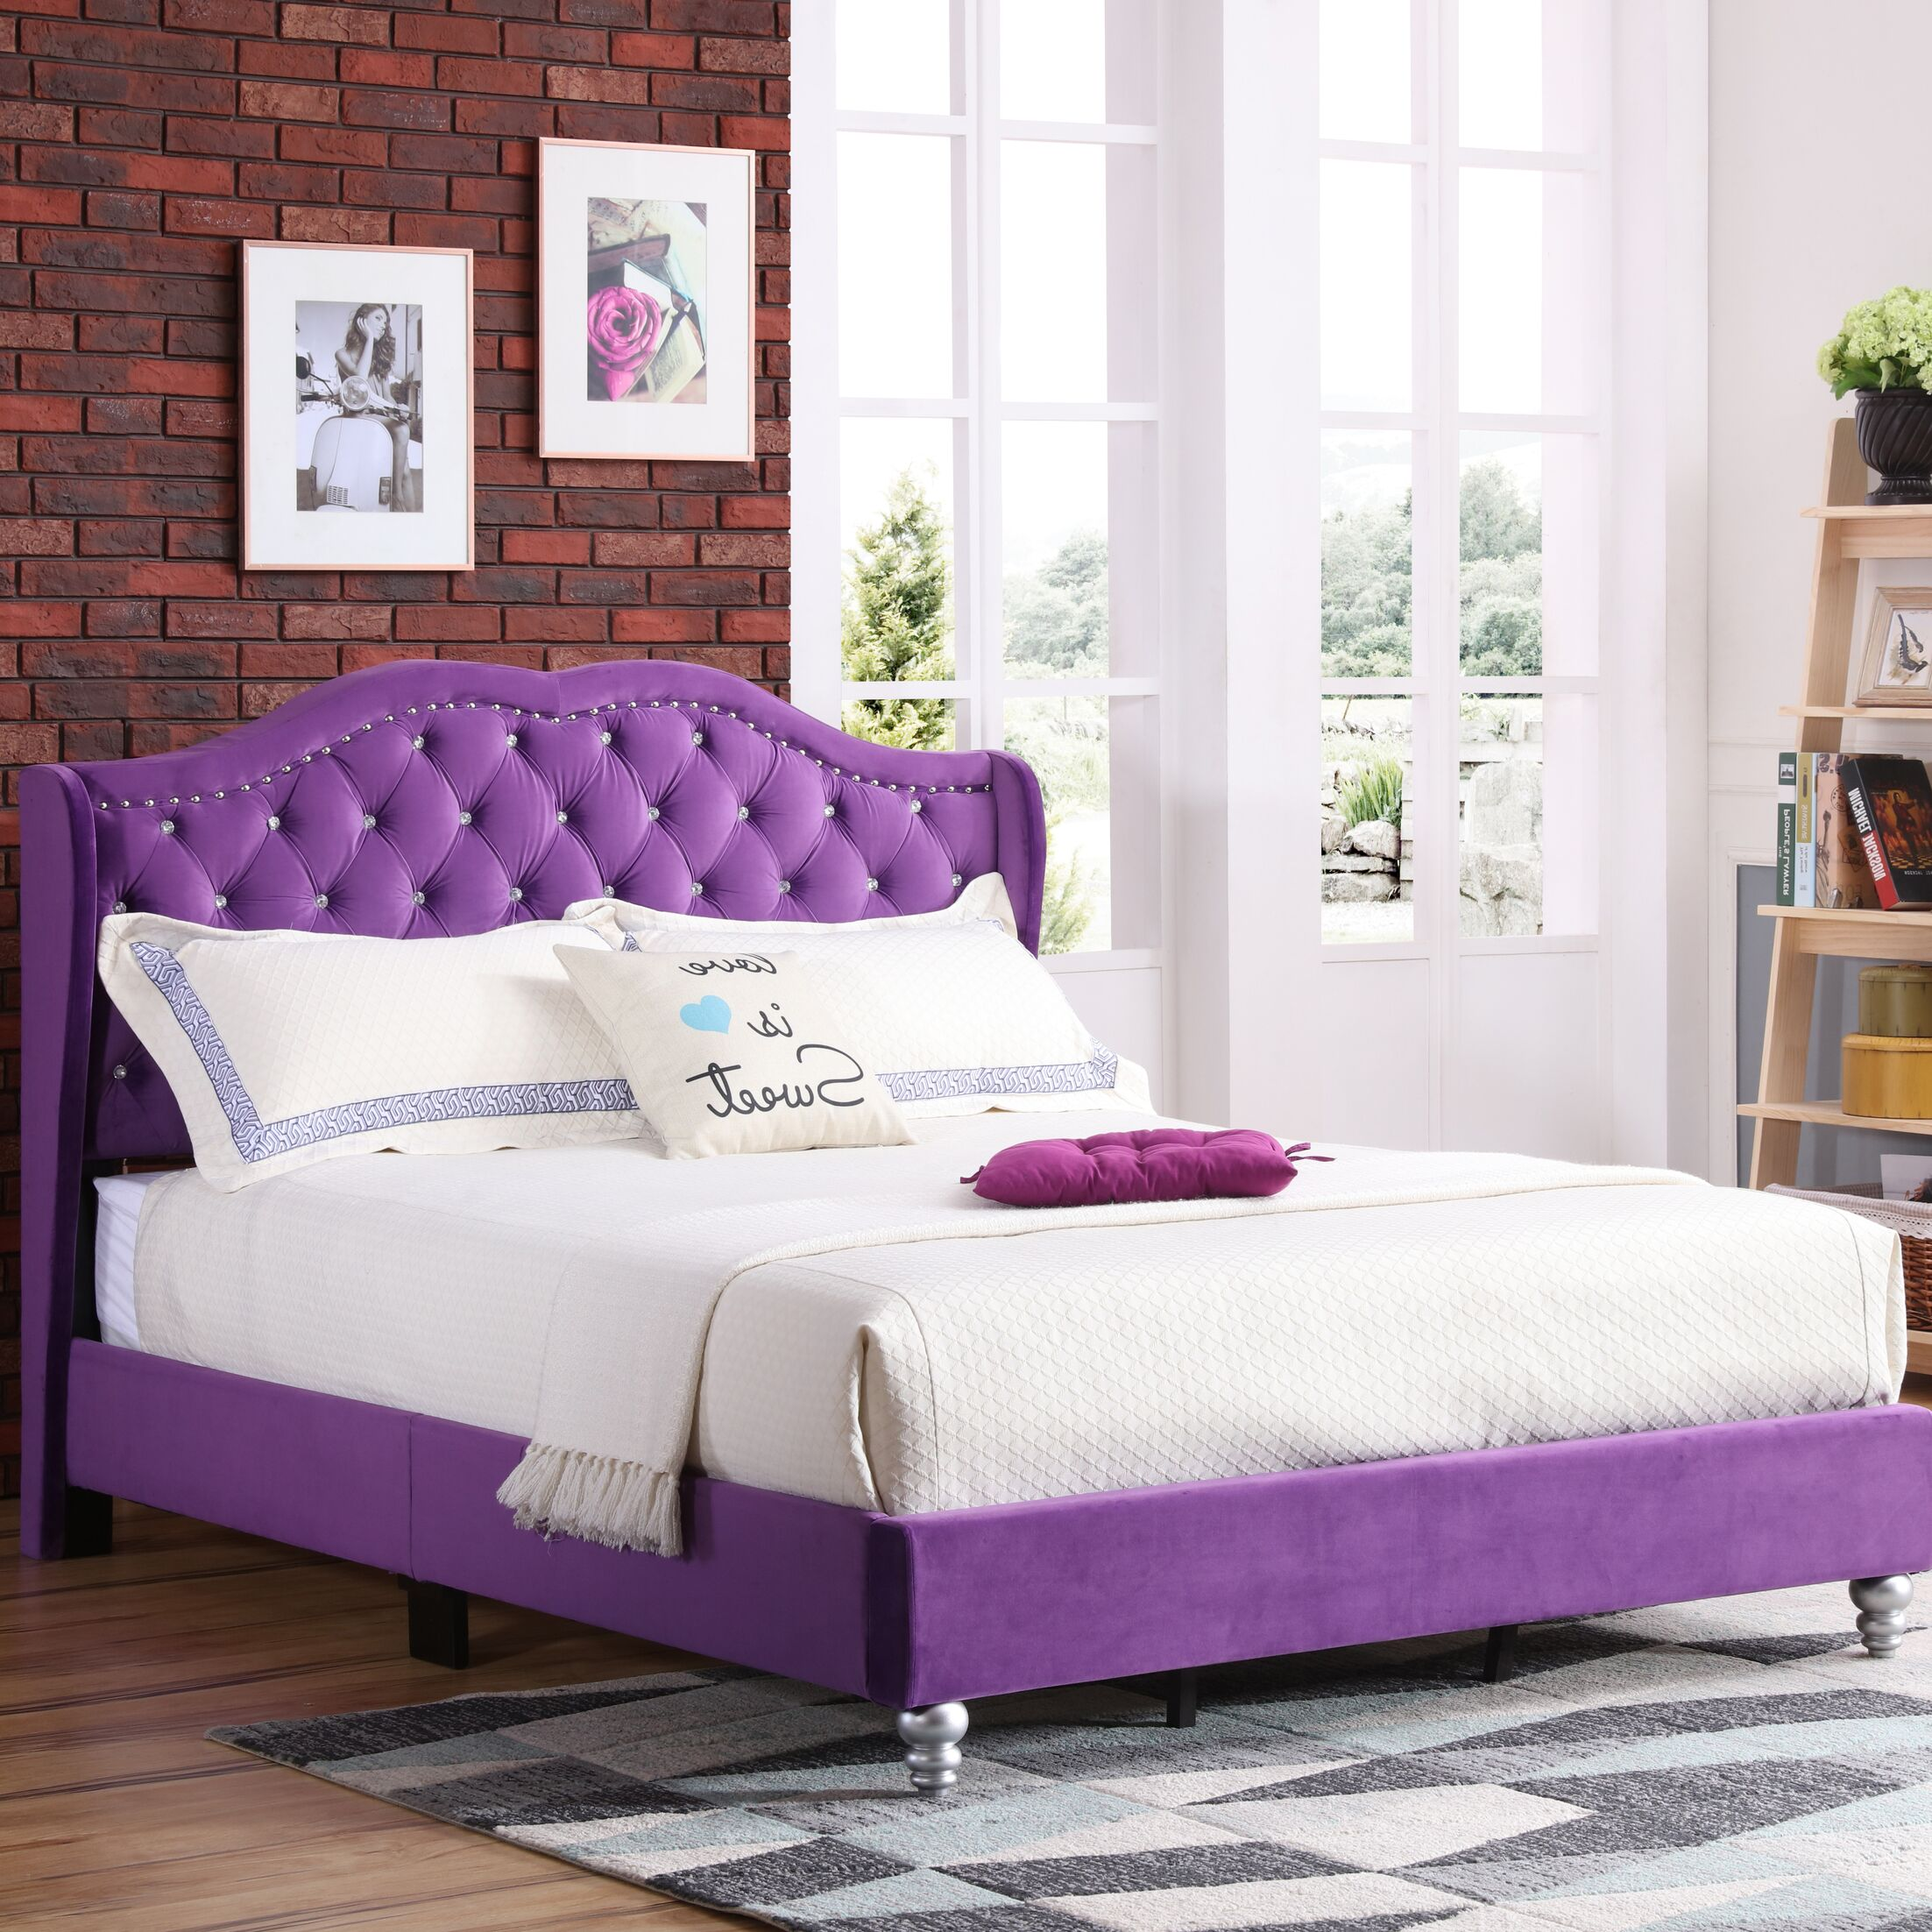 Colbourne Upholstered Panel Bed Size: King, Color: Purple